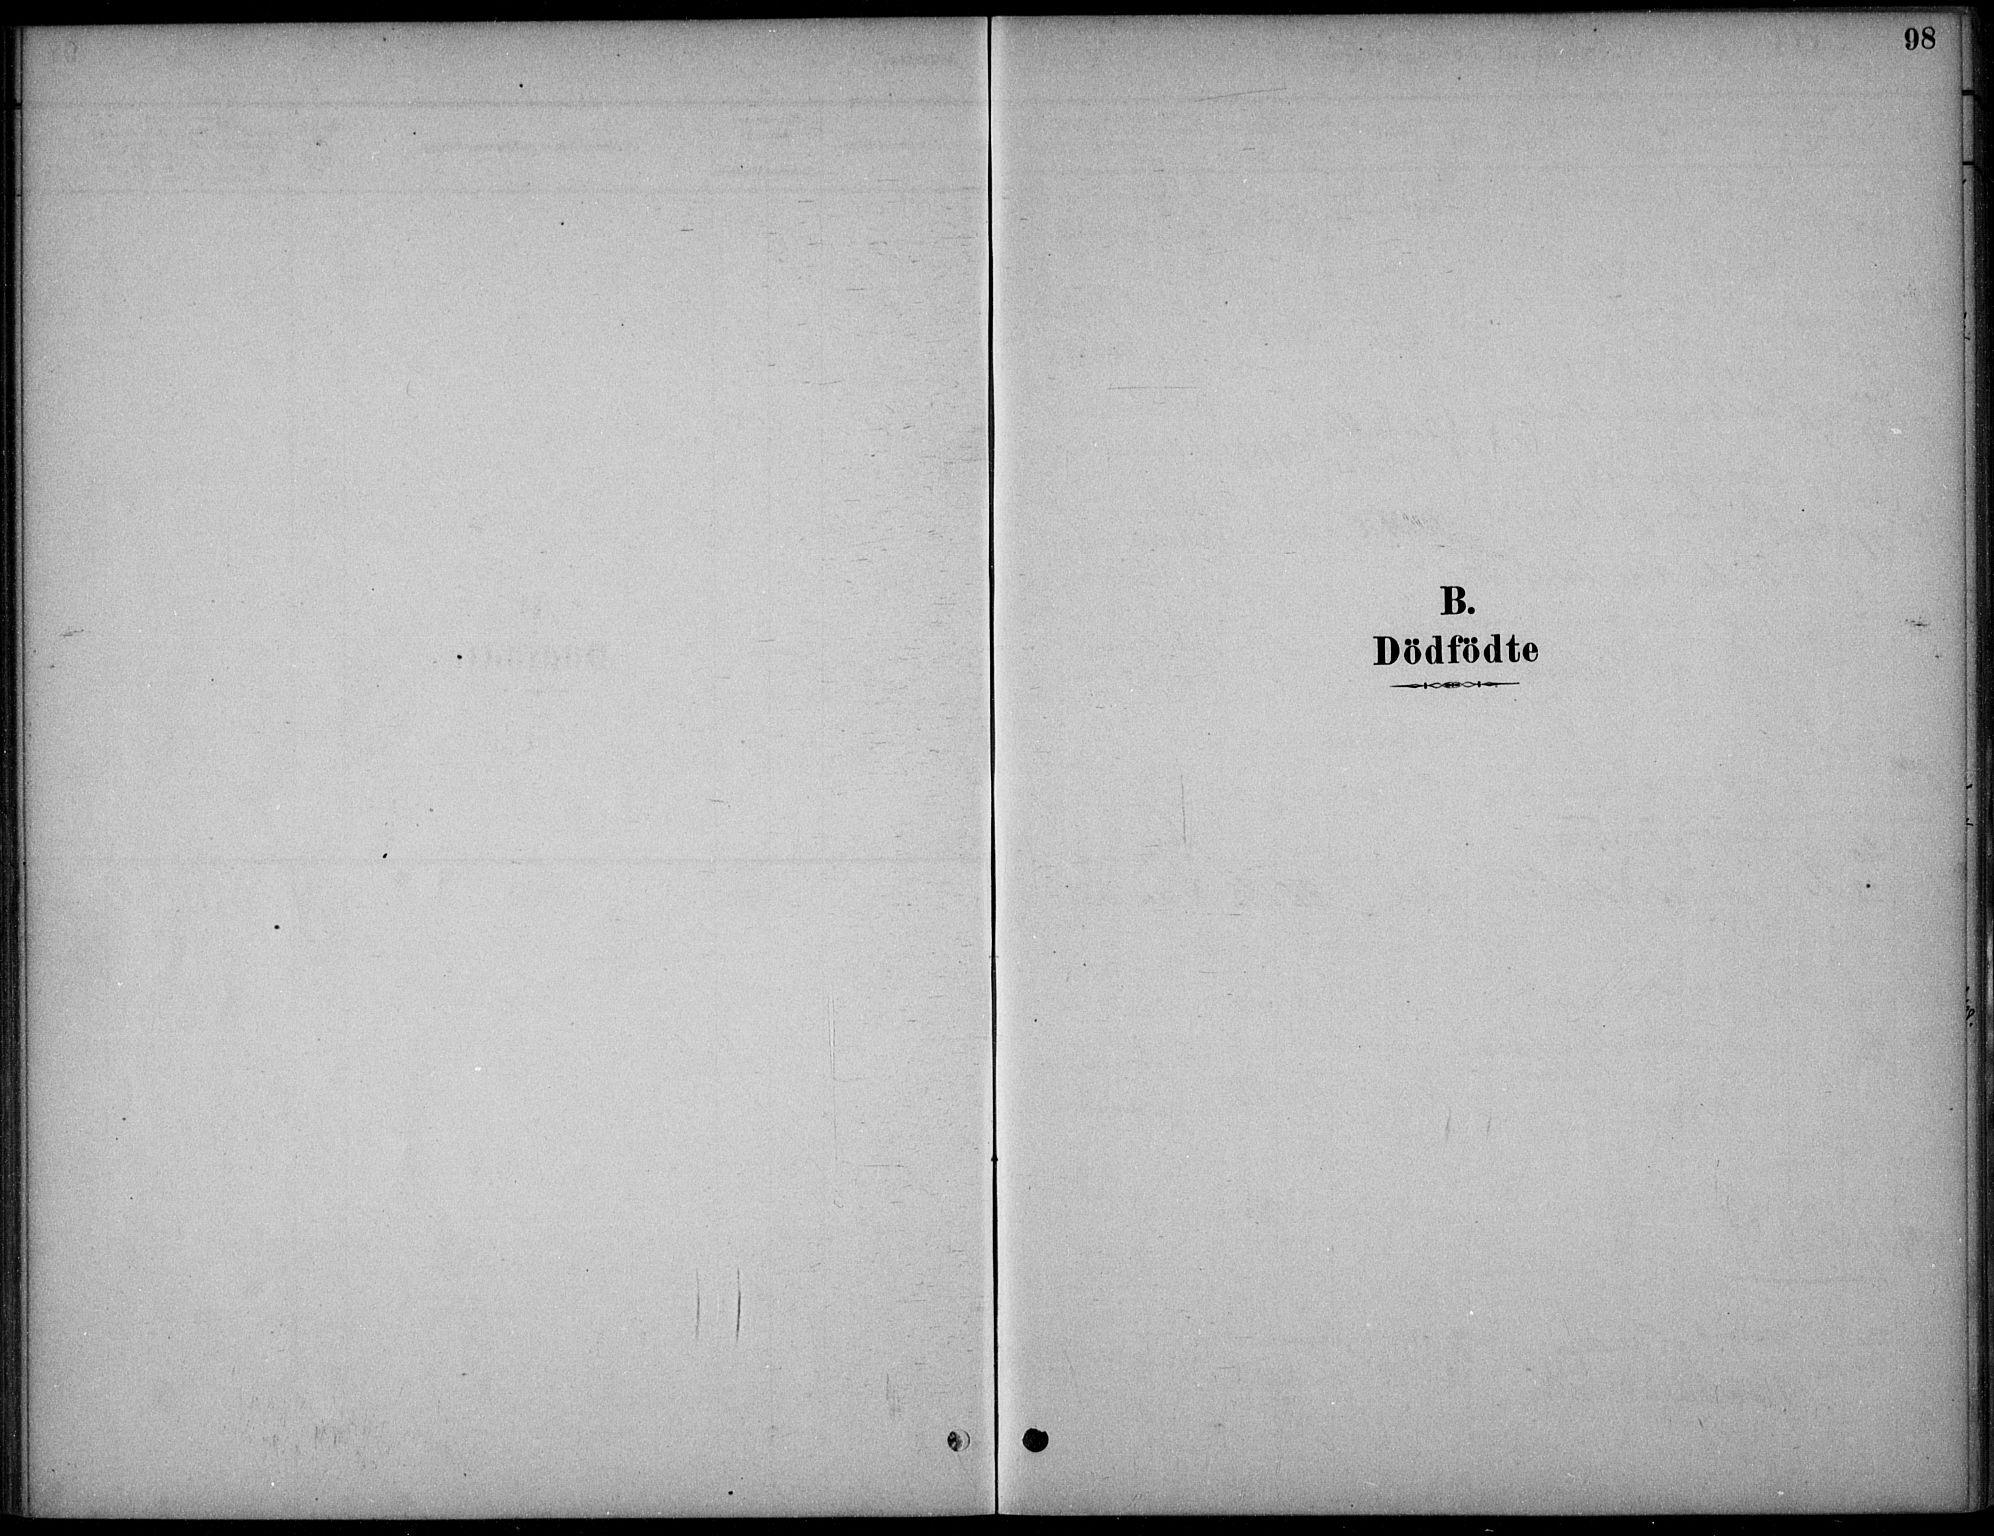 SAKO, Hjartdal kirkebøker, F/Fc/L0002: Ministerialbok nr. III 2, 1880-1936, s. 98